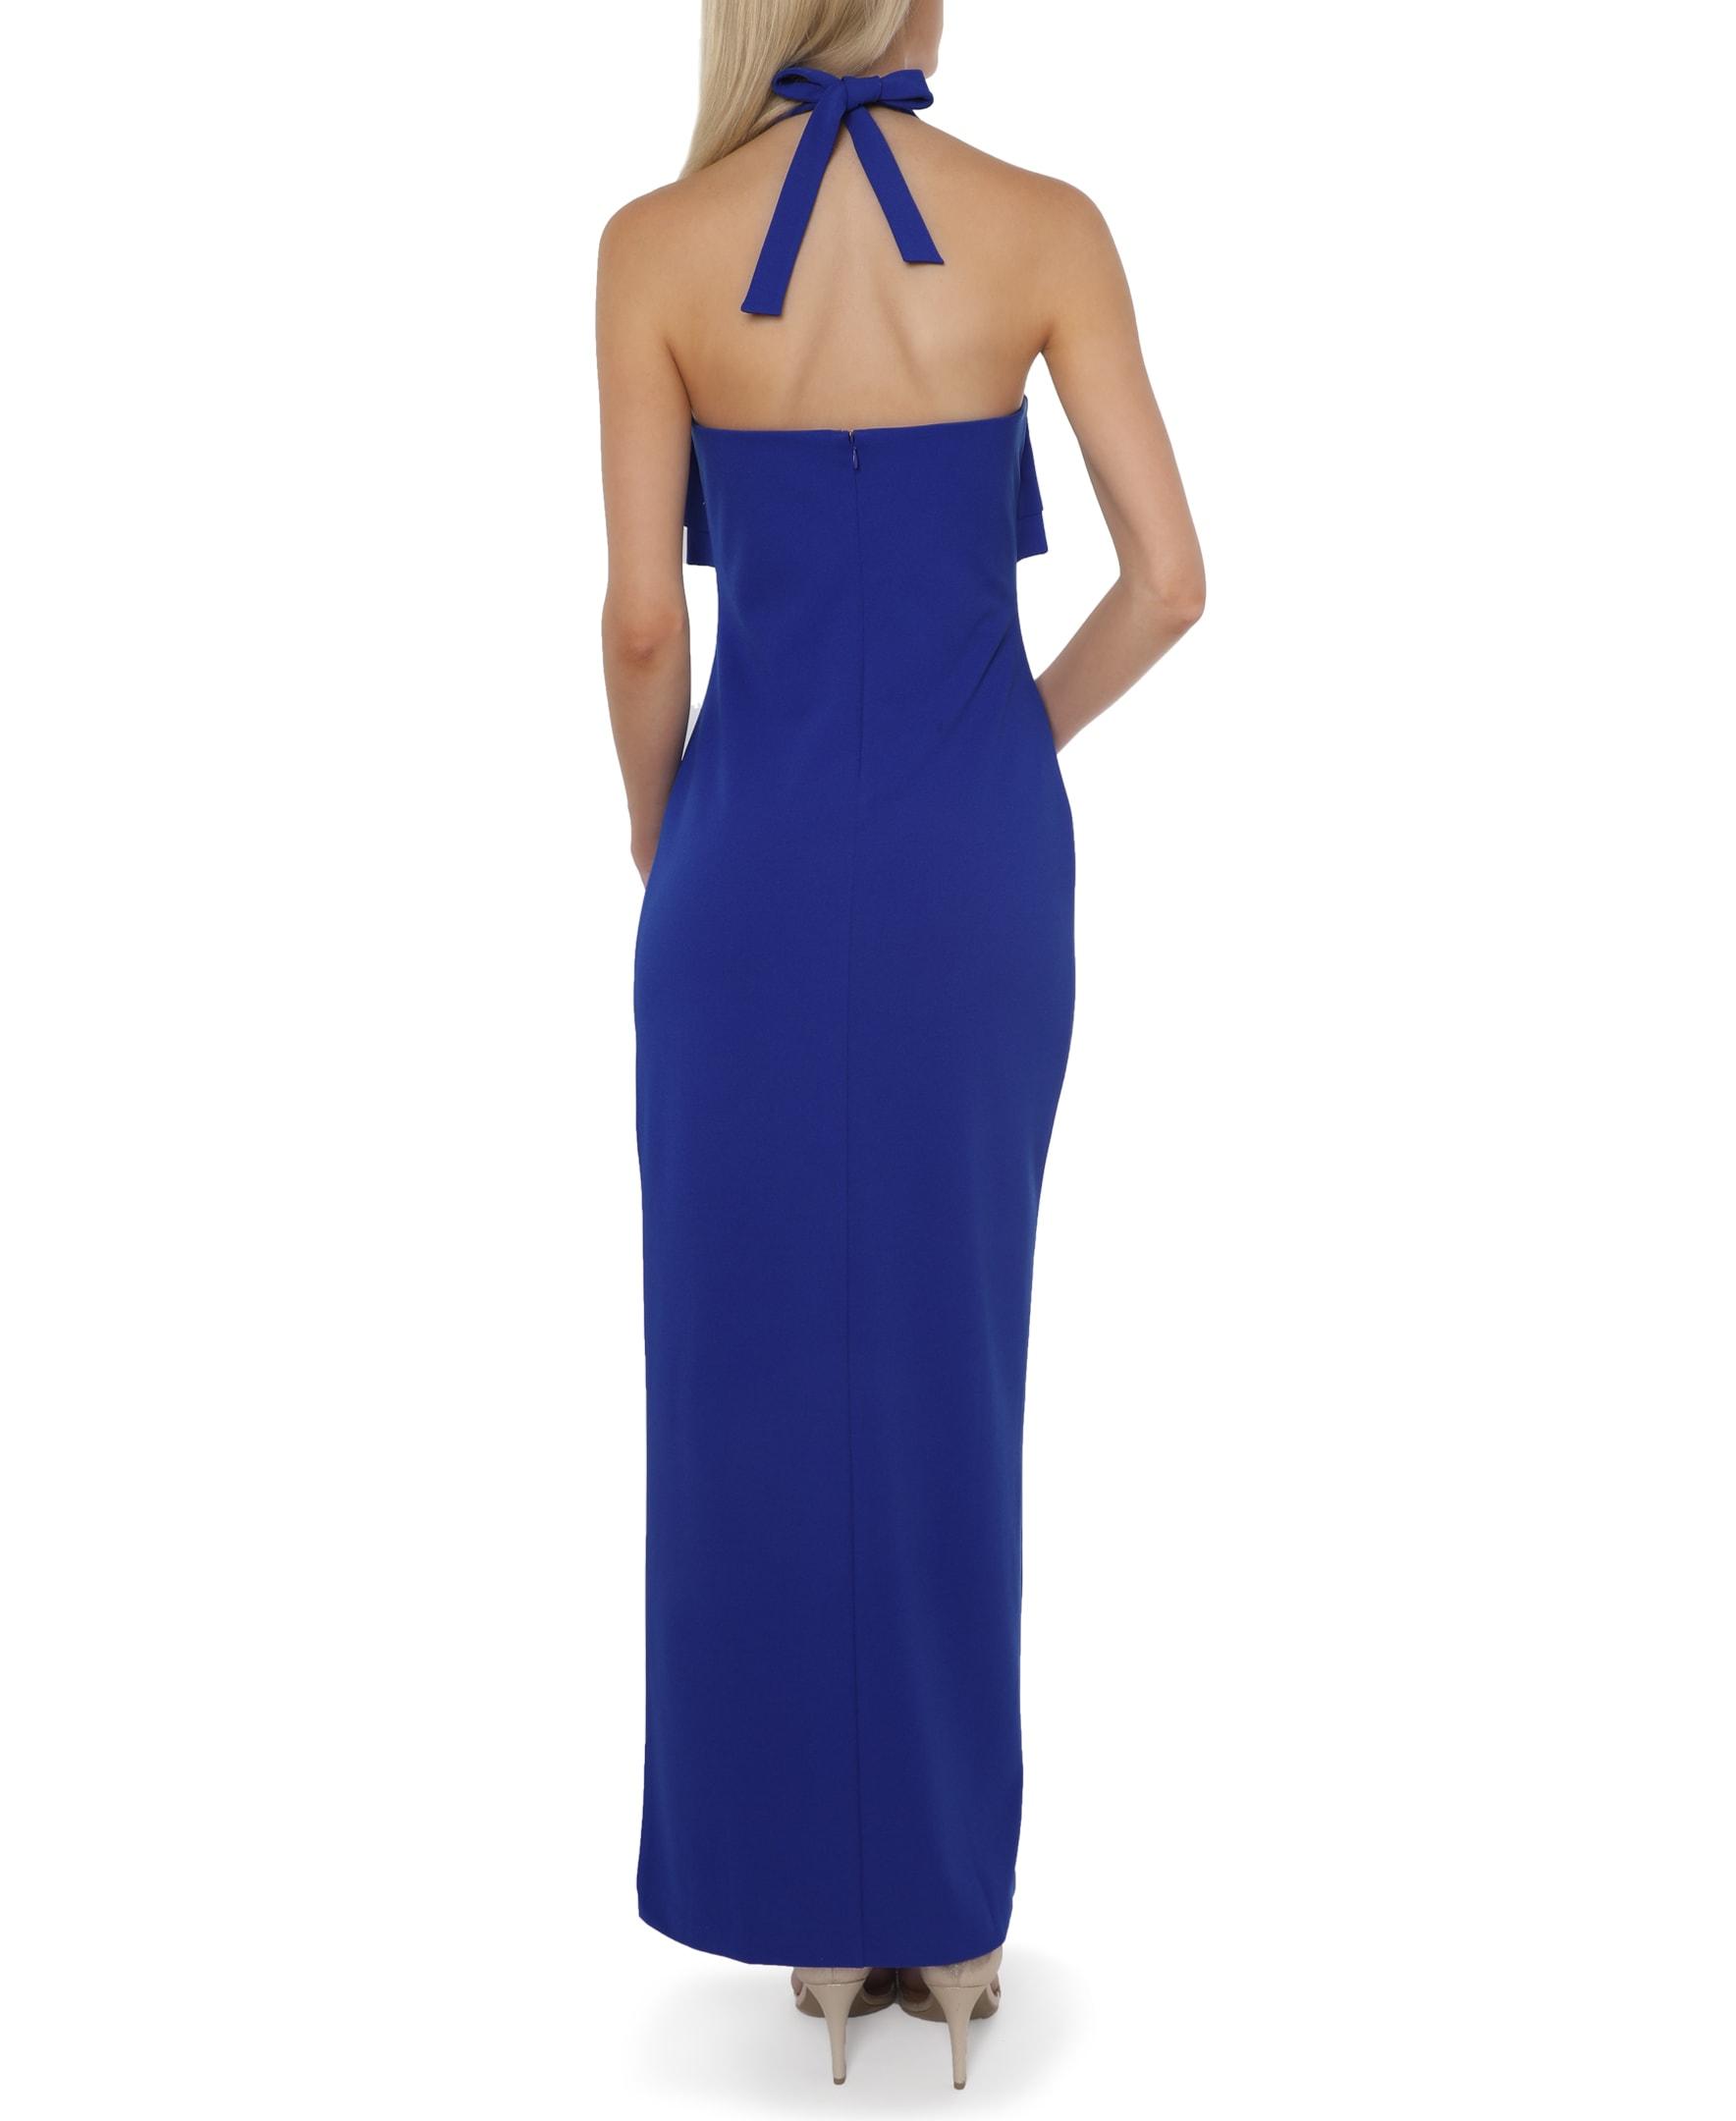 Bebe Ruffle Halter Gown - cobalt - Back